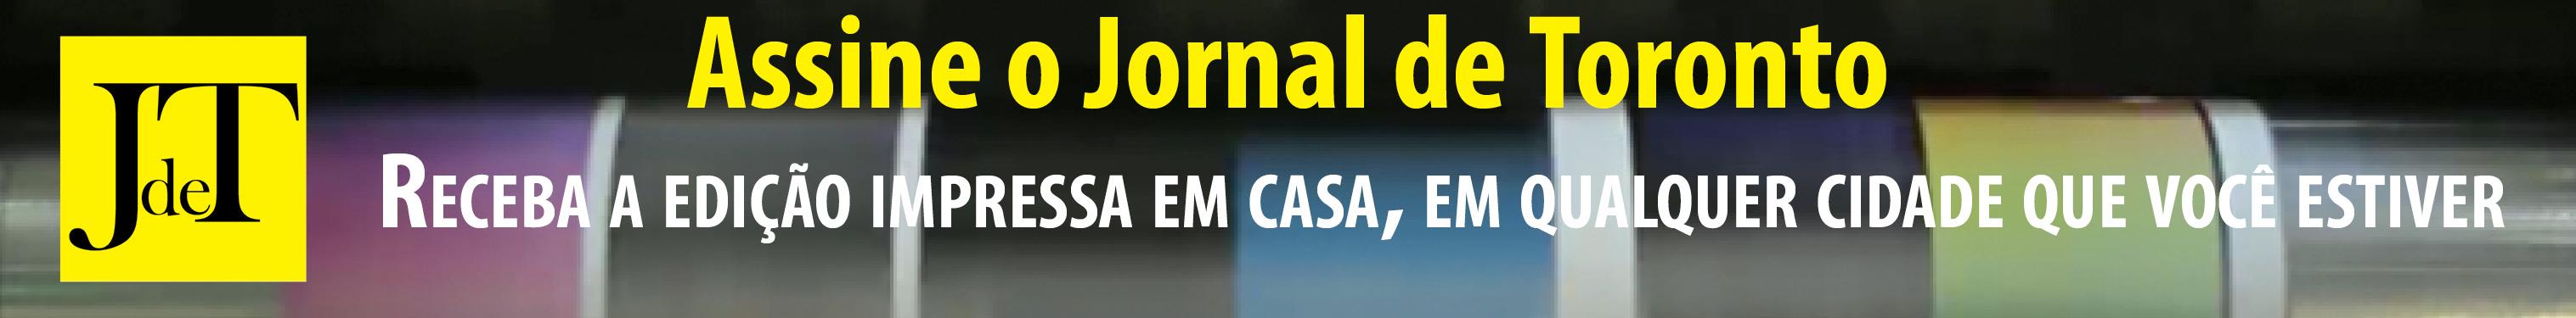 Anúncio JdeT assinatura_banner